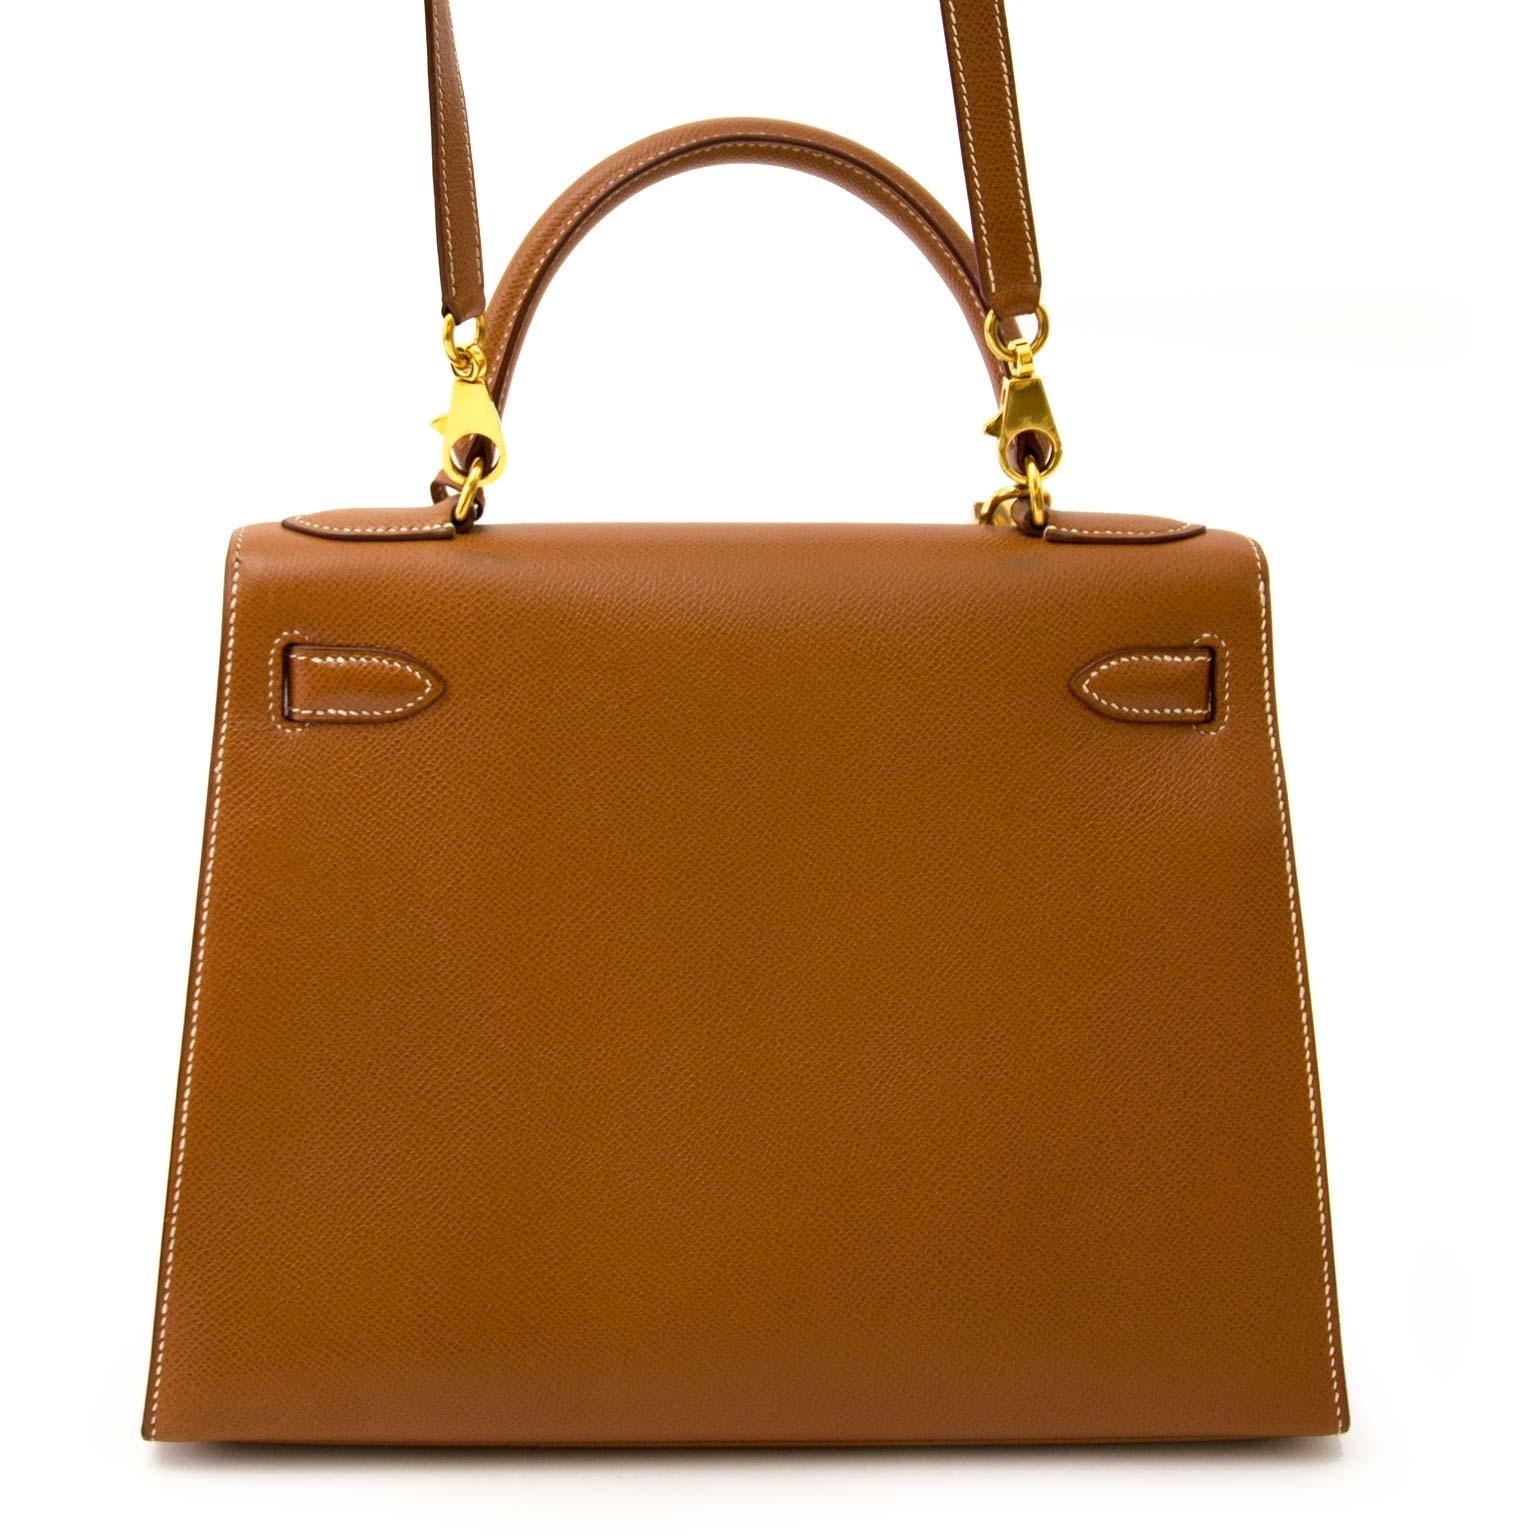 shop safe ands ecure online at labellov.com Hermès Kelly 28cm gold cuir courchevel GHW skip the waitinglist